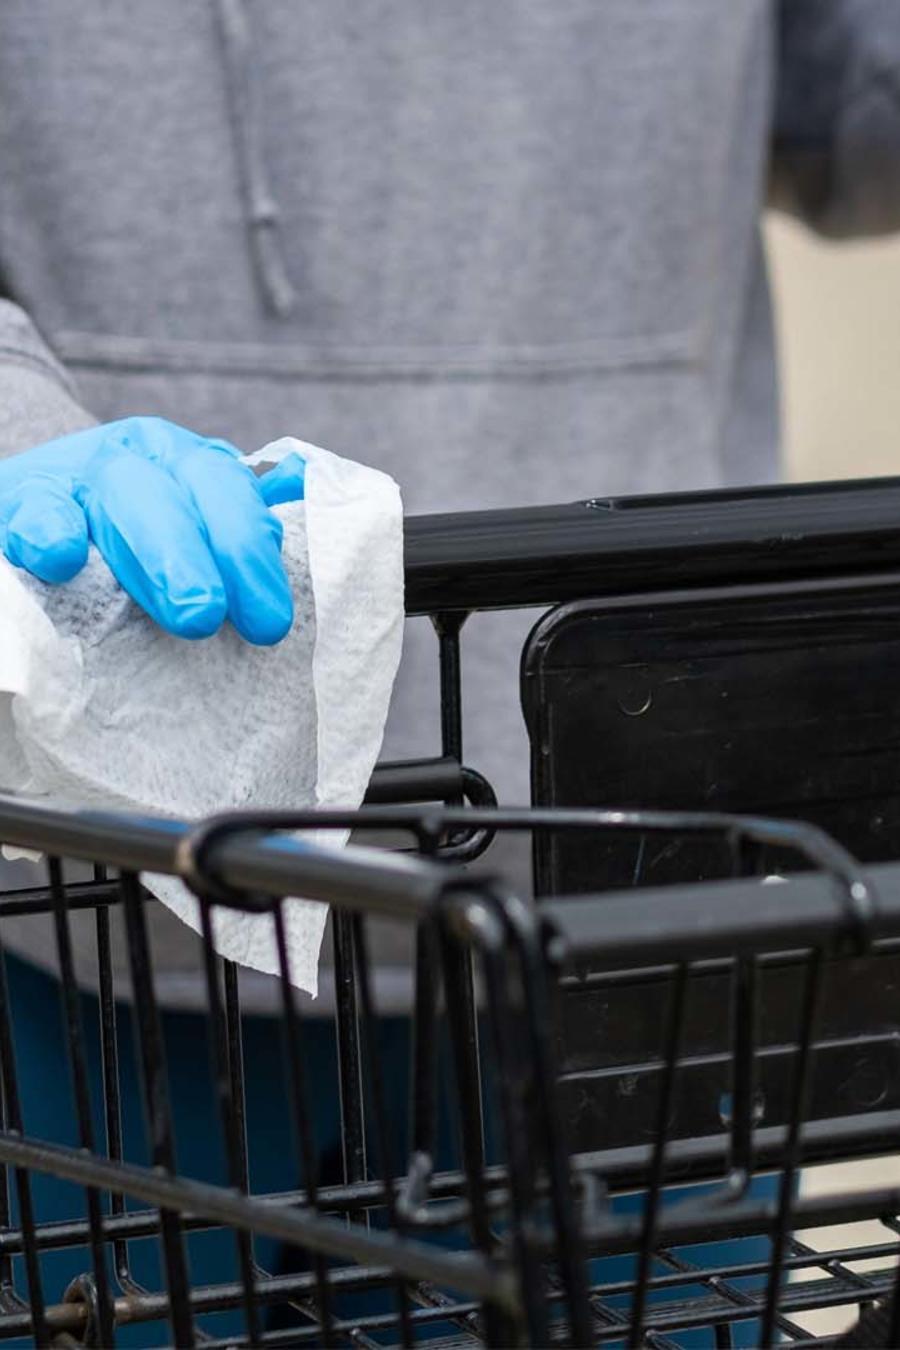 Sugerencias para evitar bacterias de carritos de compras